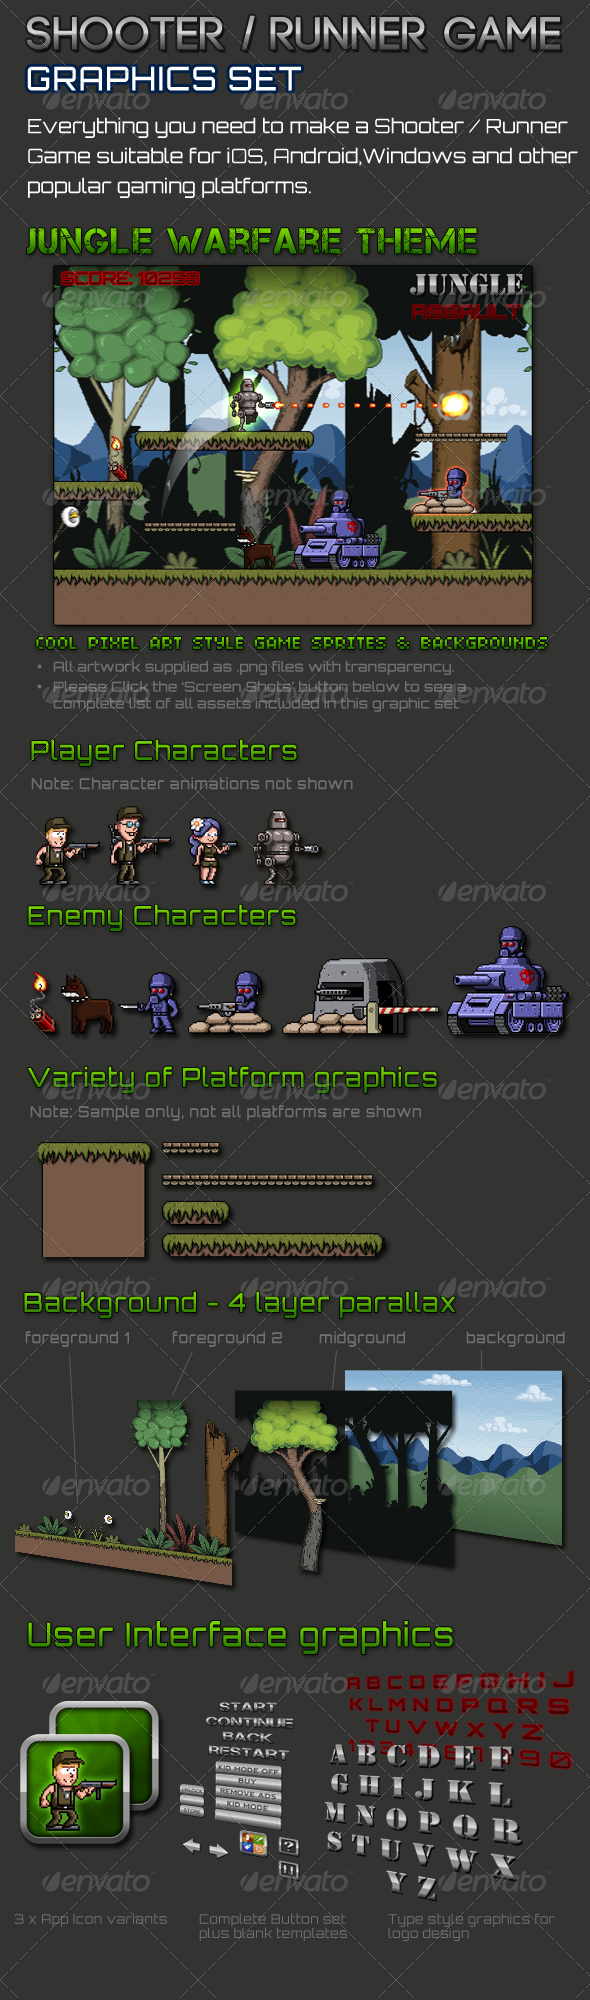 Shooter/Runner Game Graphic Set Runner games, Pixel